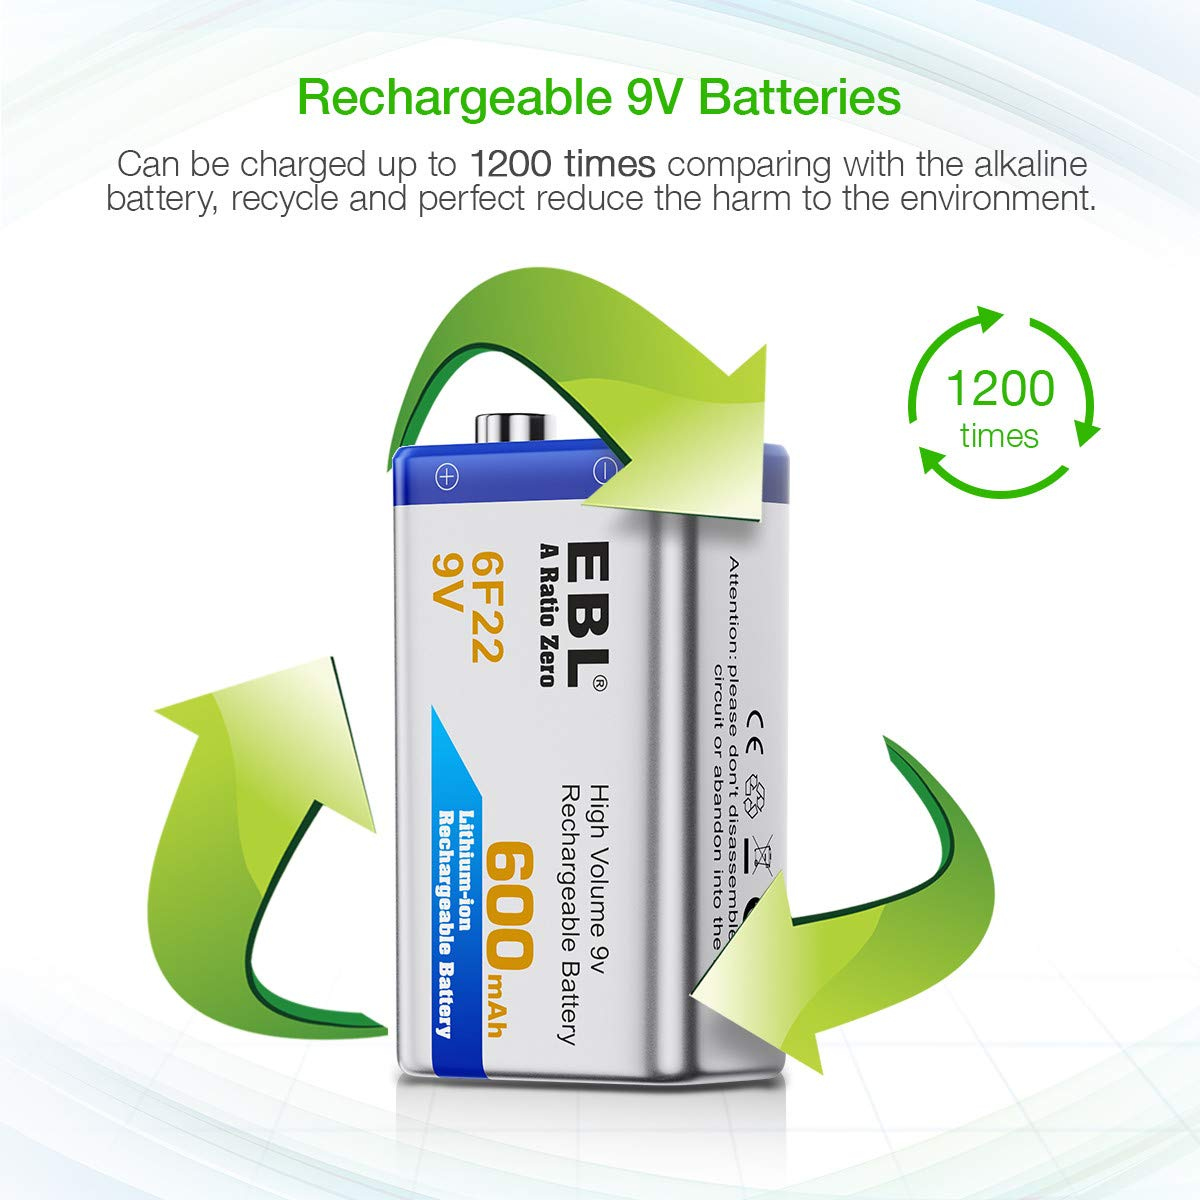 Ebl 12 Counts Rechargeable 9v Batteries Li Ion Diagram Get Free Image About Also 9 Volt Solar Battery Charger Circuit Electronics